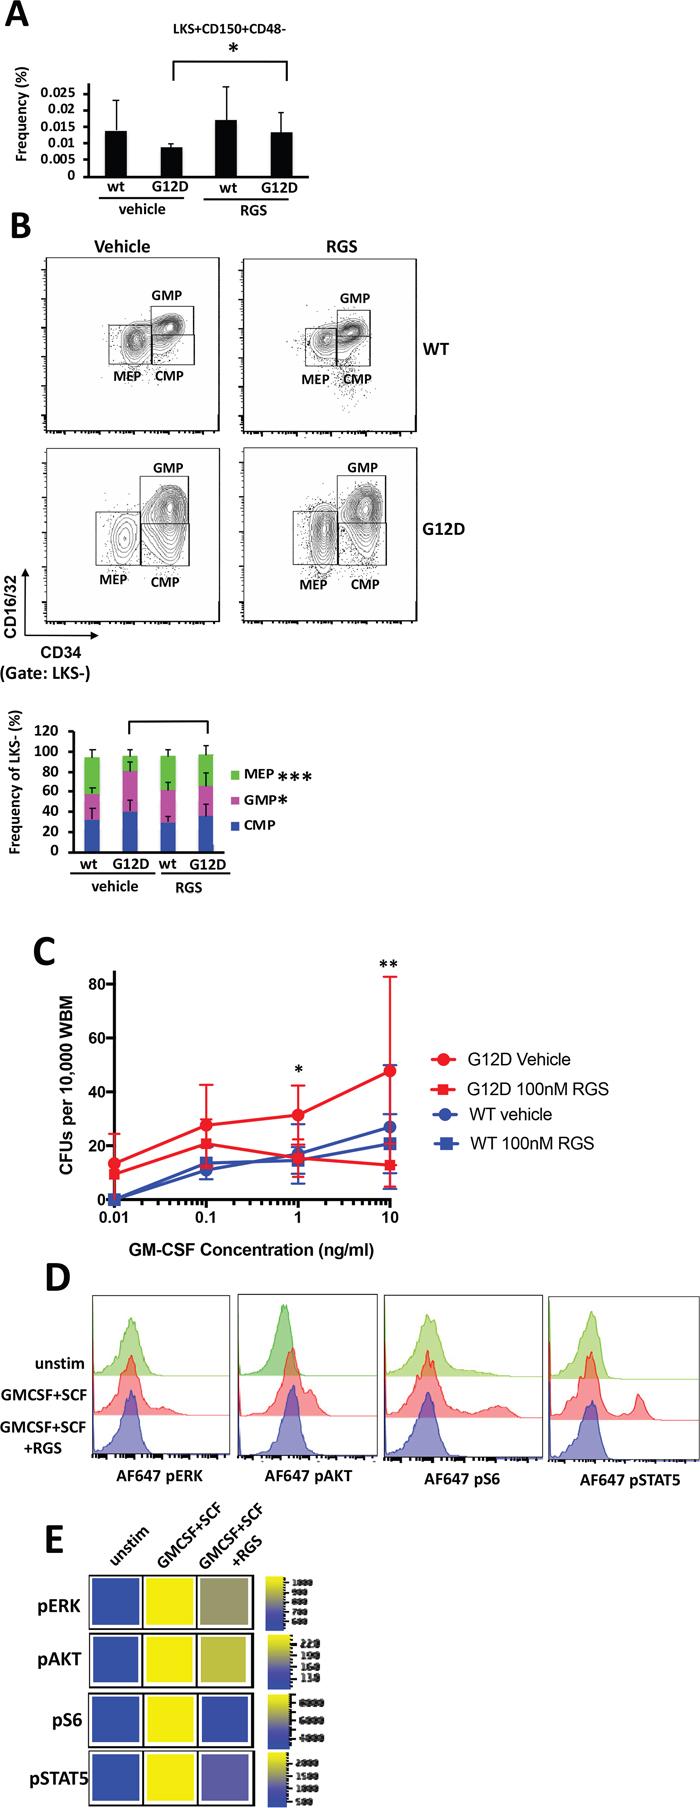 In vitro and in vivo effects of rigosertib on KRASG12D hematopoietic stem cells and progenitors.